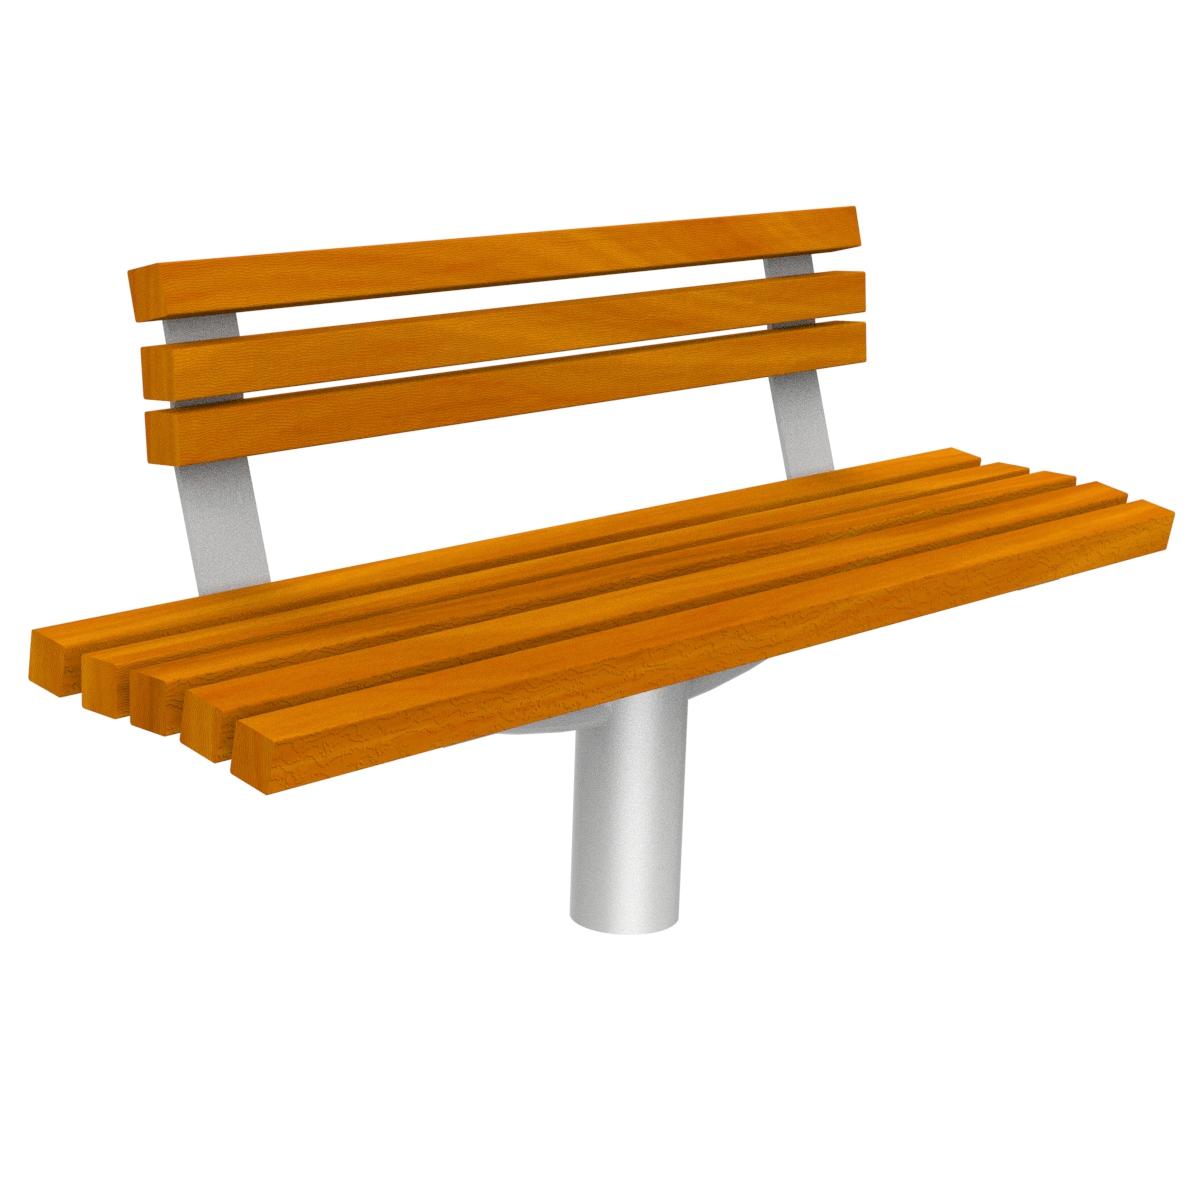 banco madera diana mobiliario urbano para sentarse parques